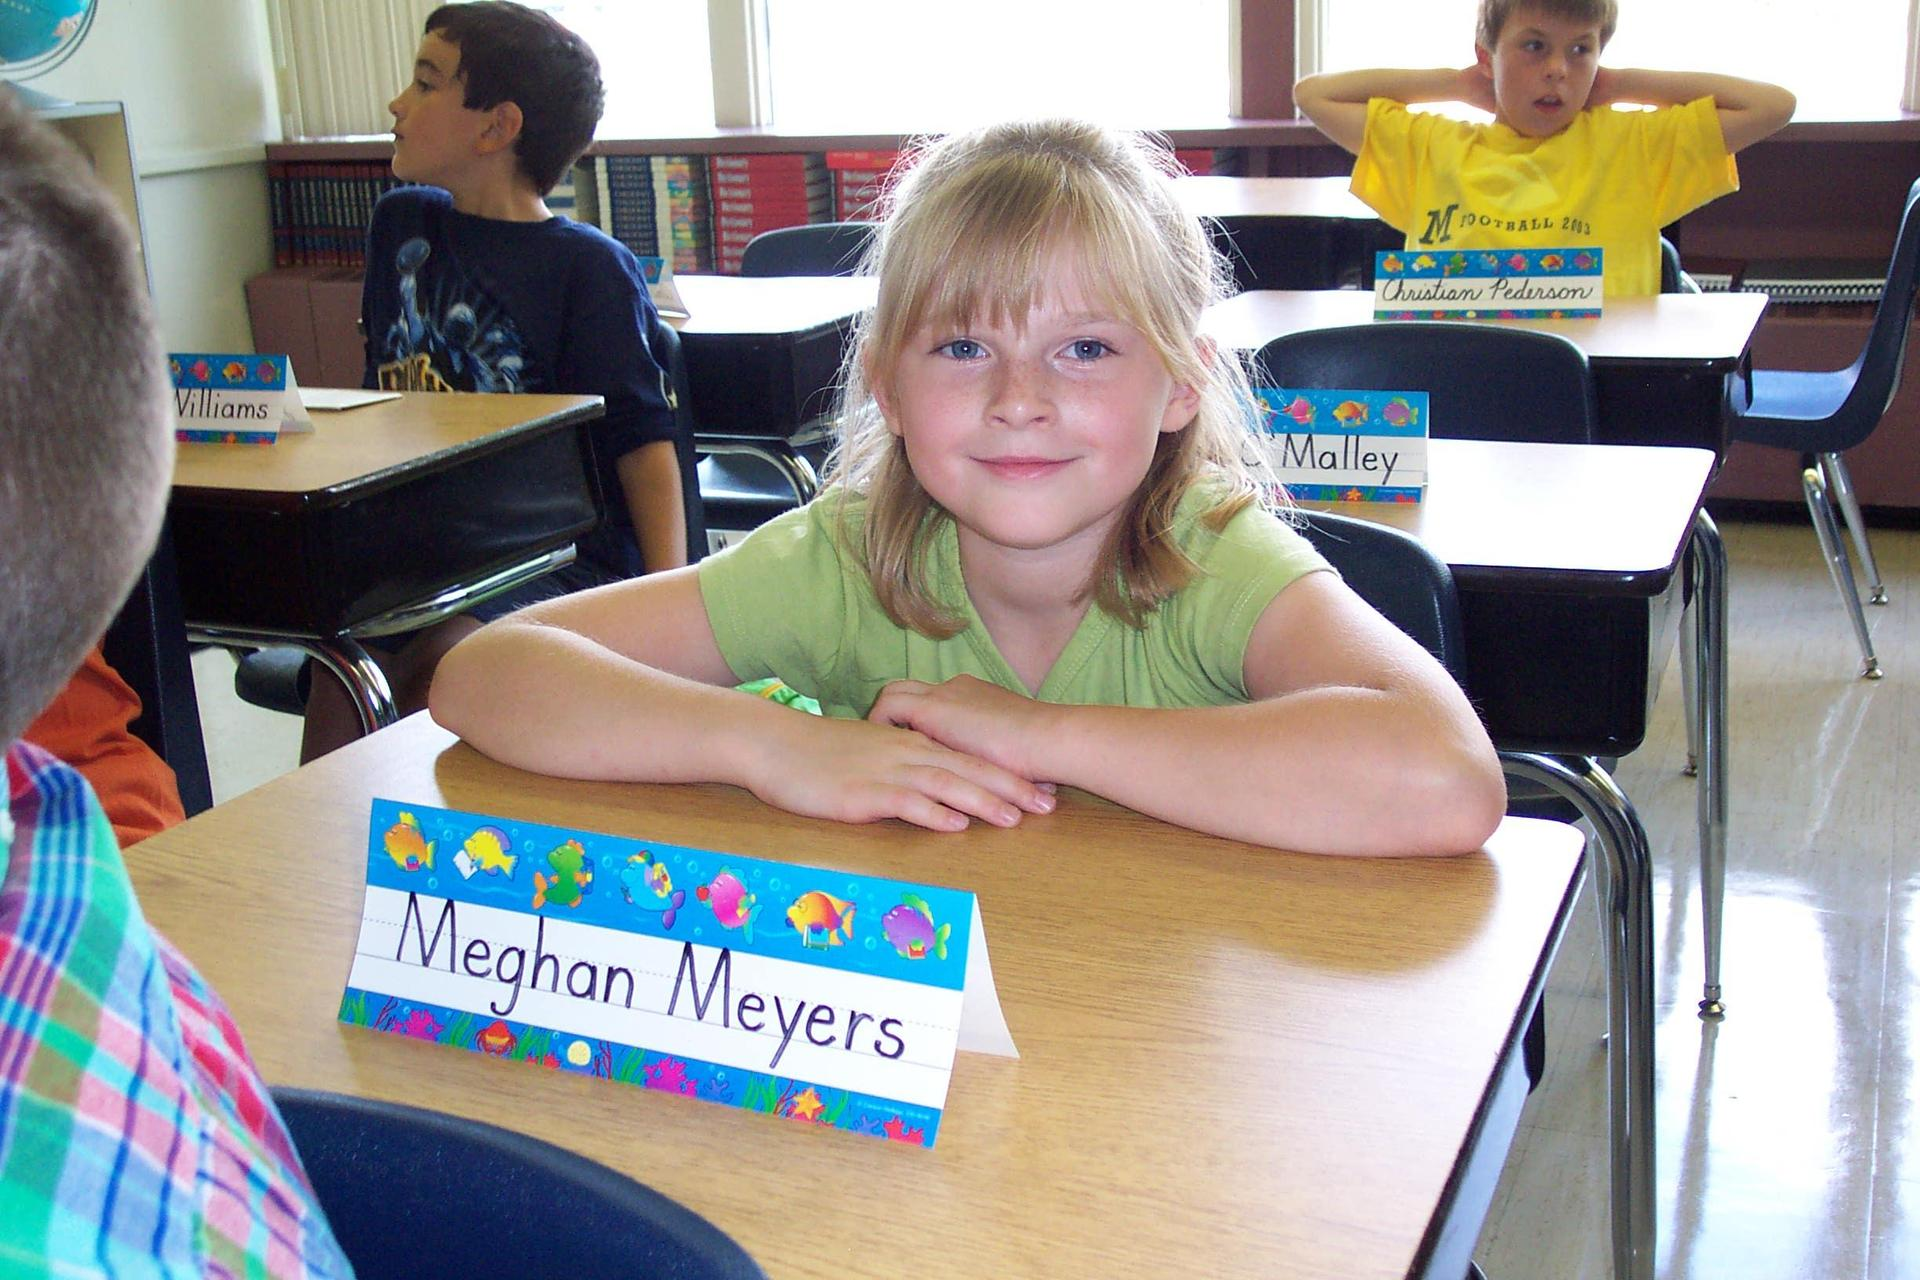 Miss Meyers